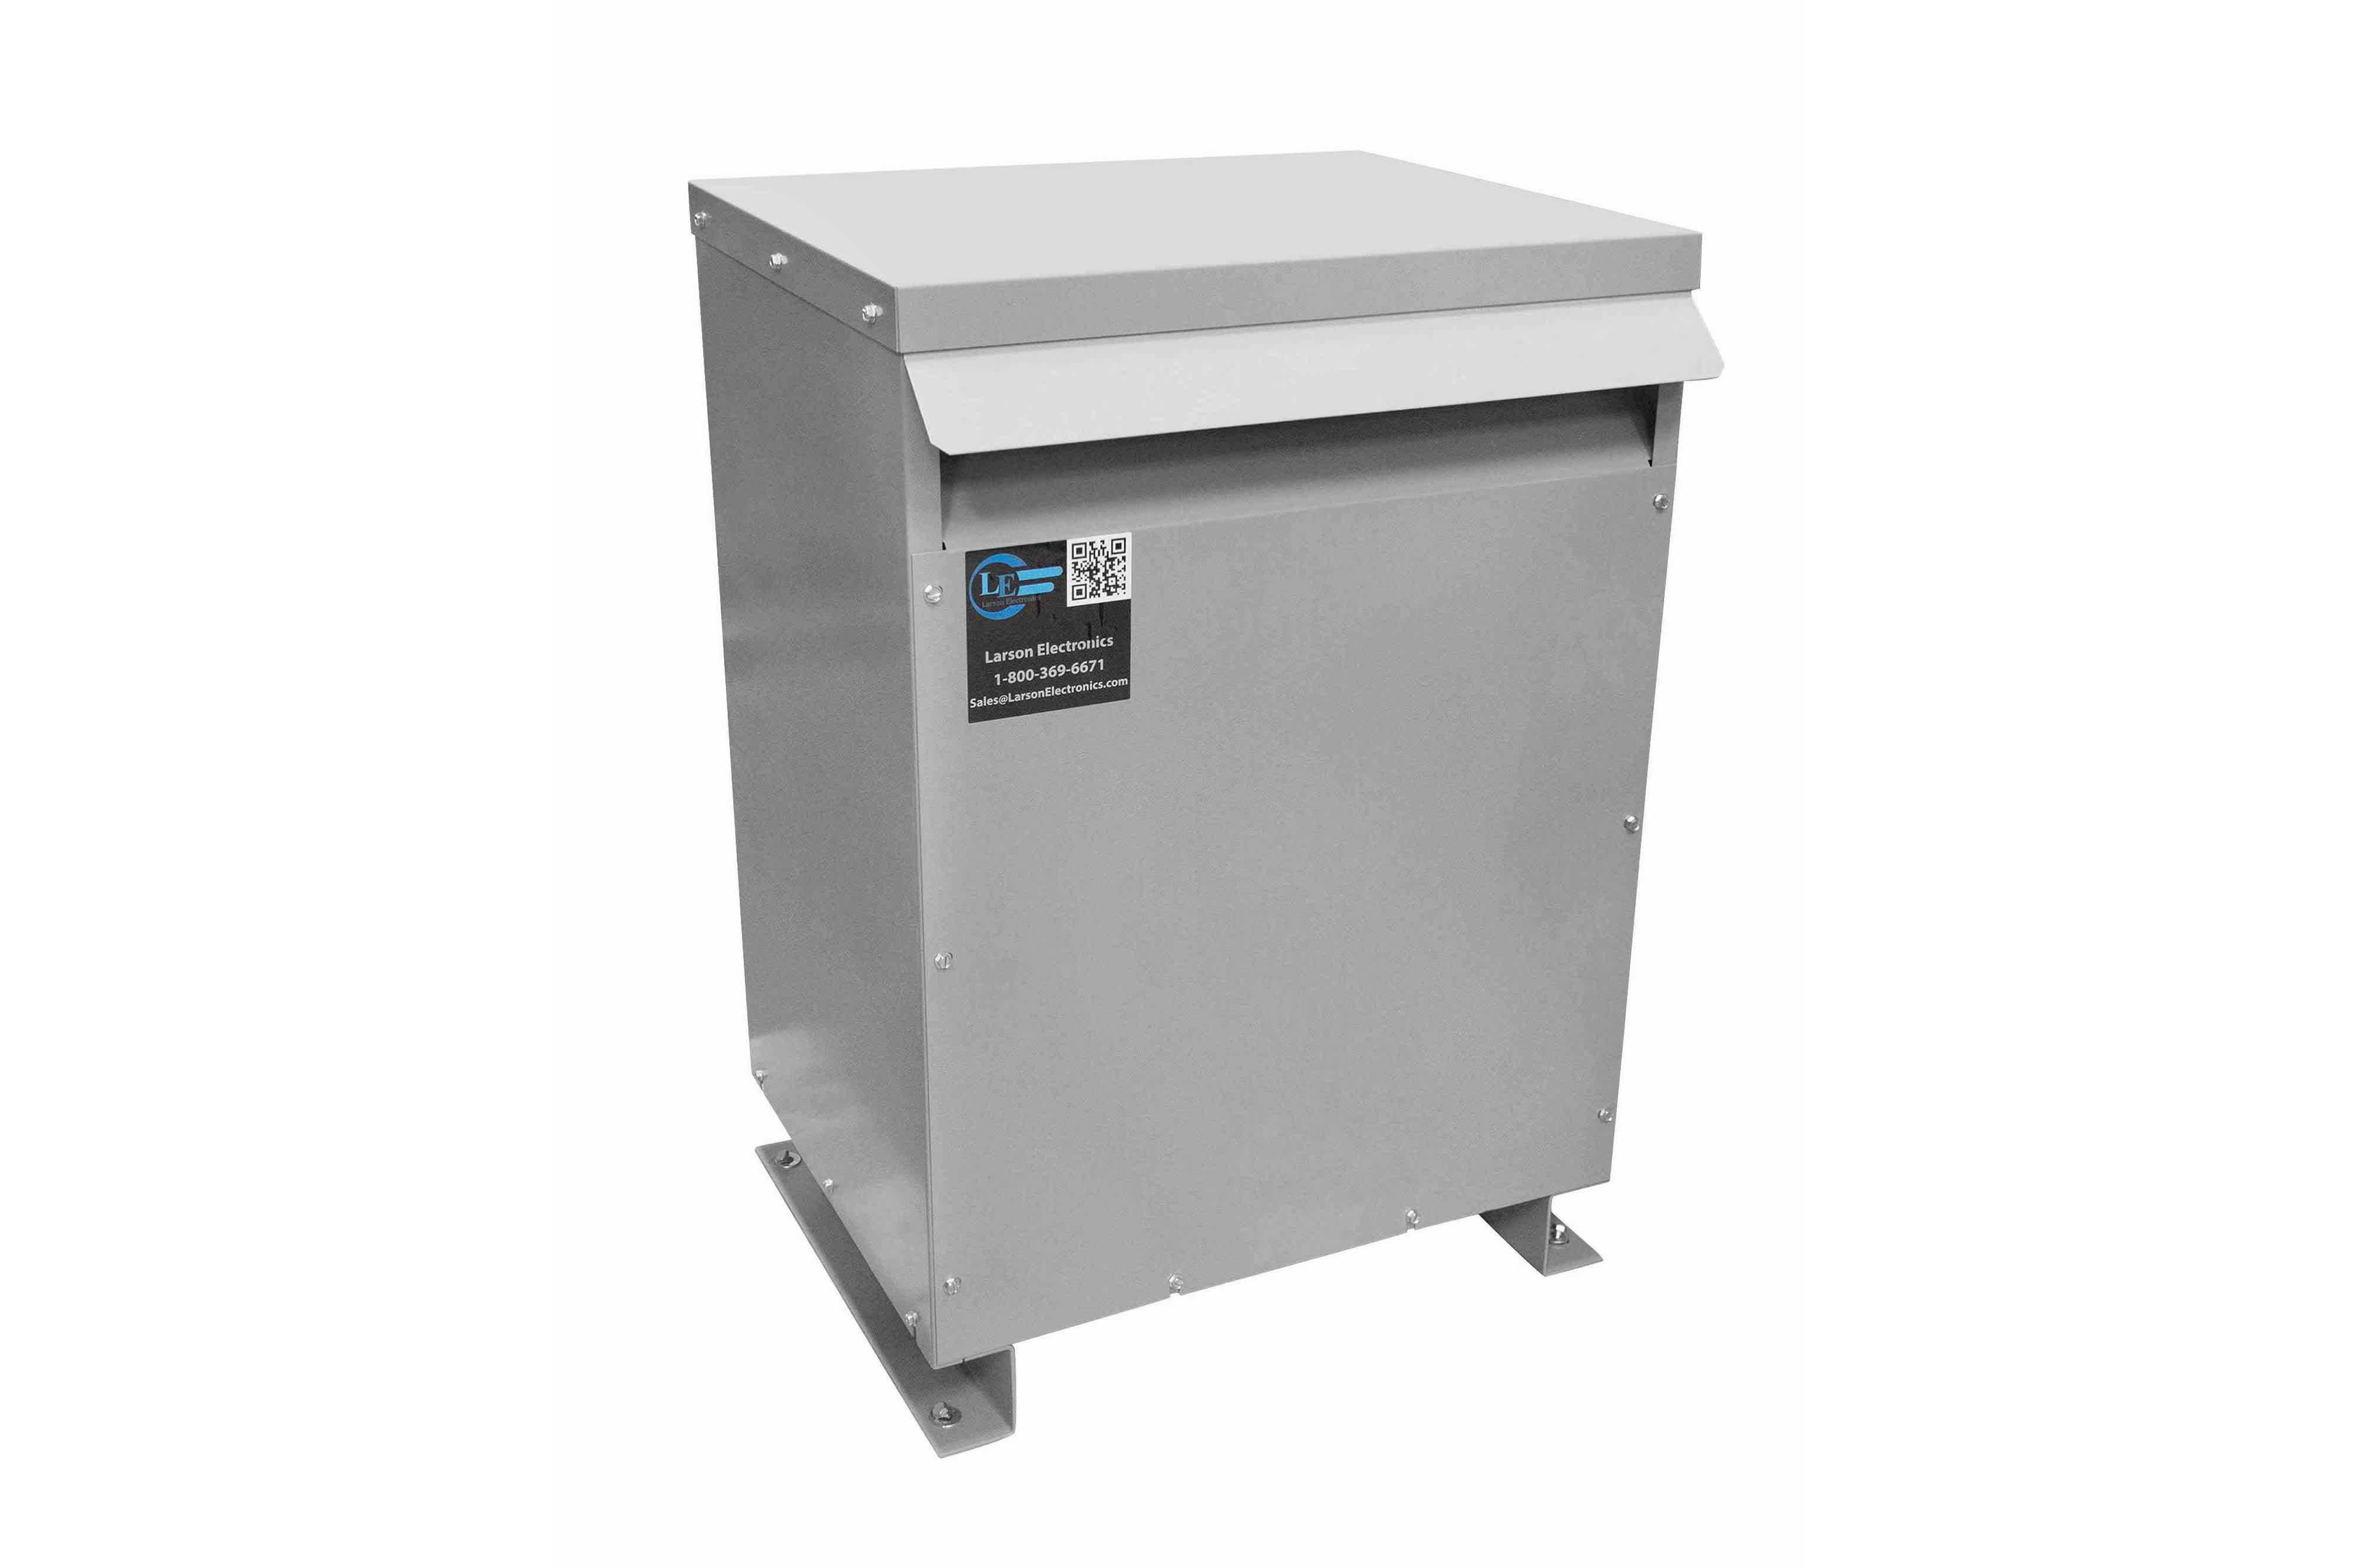 750 kVA 3PH DOE Transformer, 208V Delta Primary, 208Y/120 Wye-N Secondary, N3R, Ventilated, 60 Hz